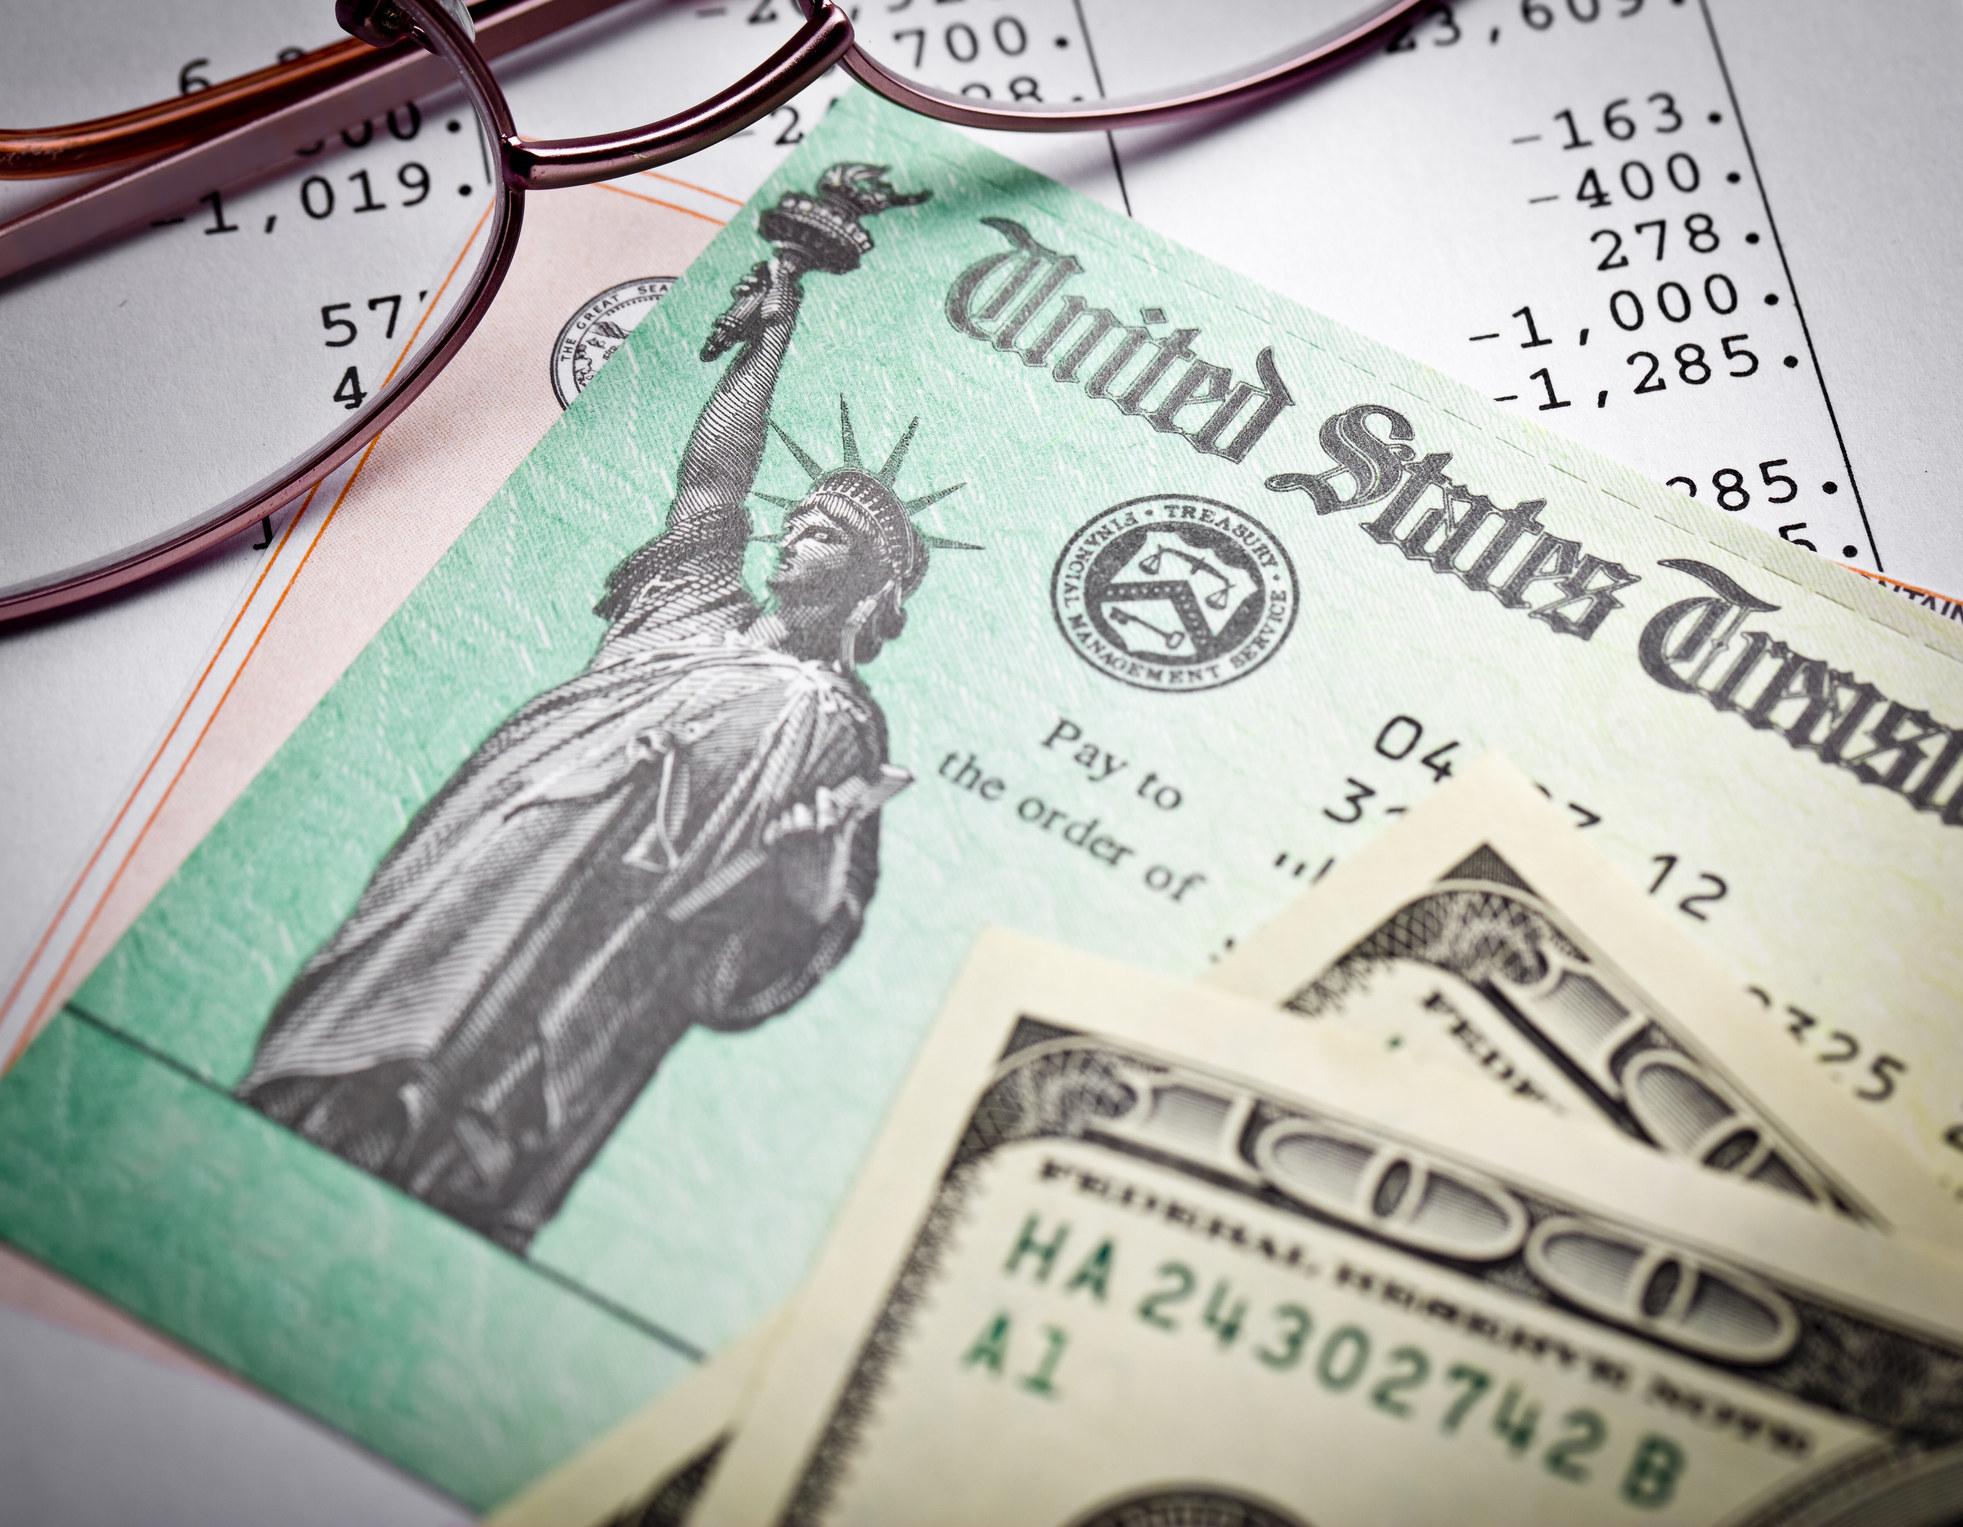 Tax check